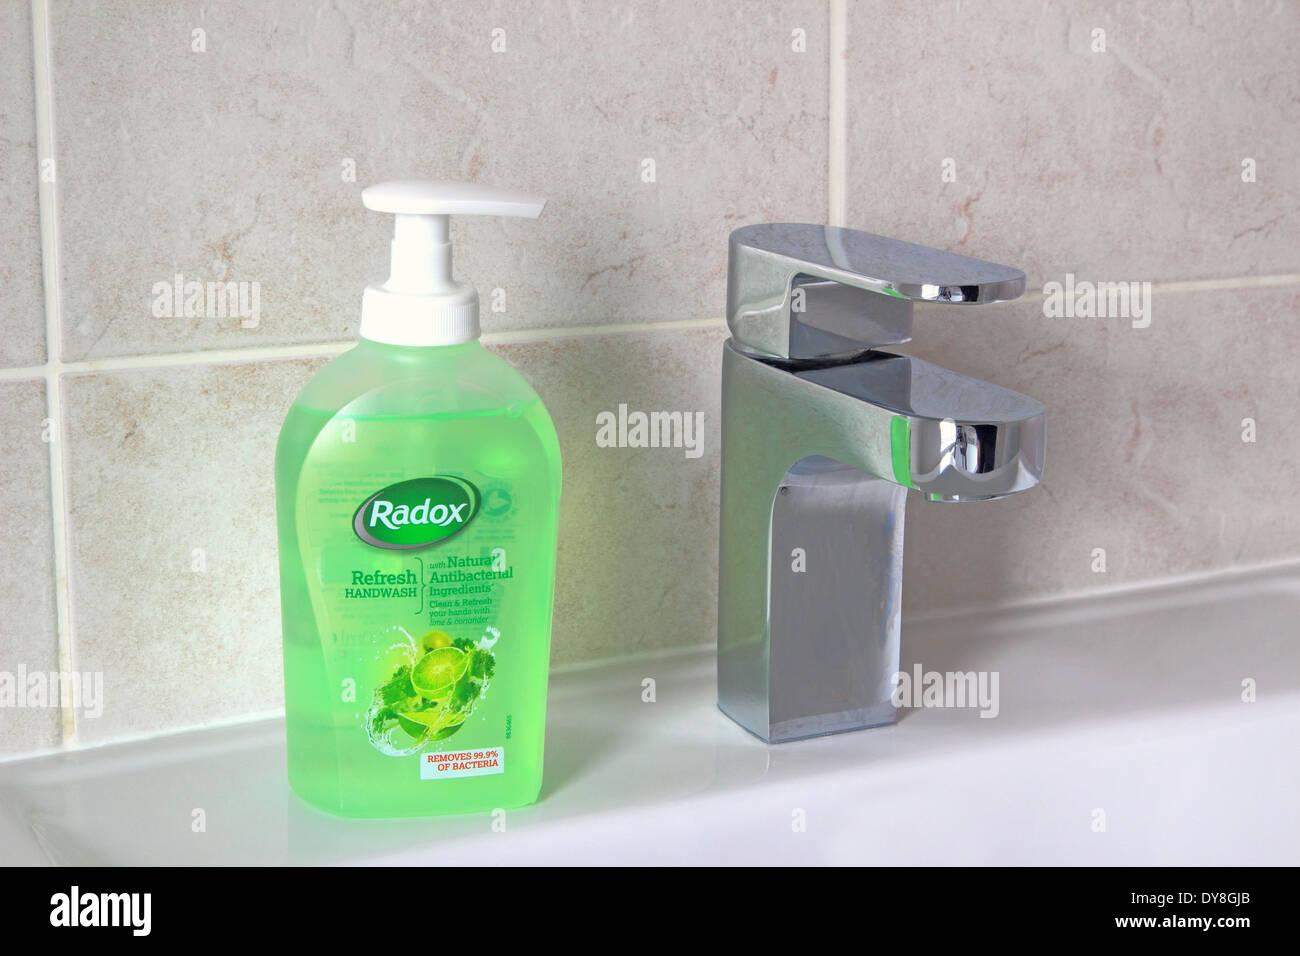 Radox Refresh Handwash Liquid Soap in a Bathroom Setting, UK - Stock Image